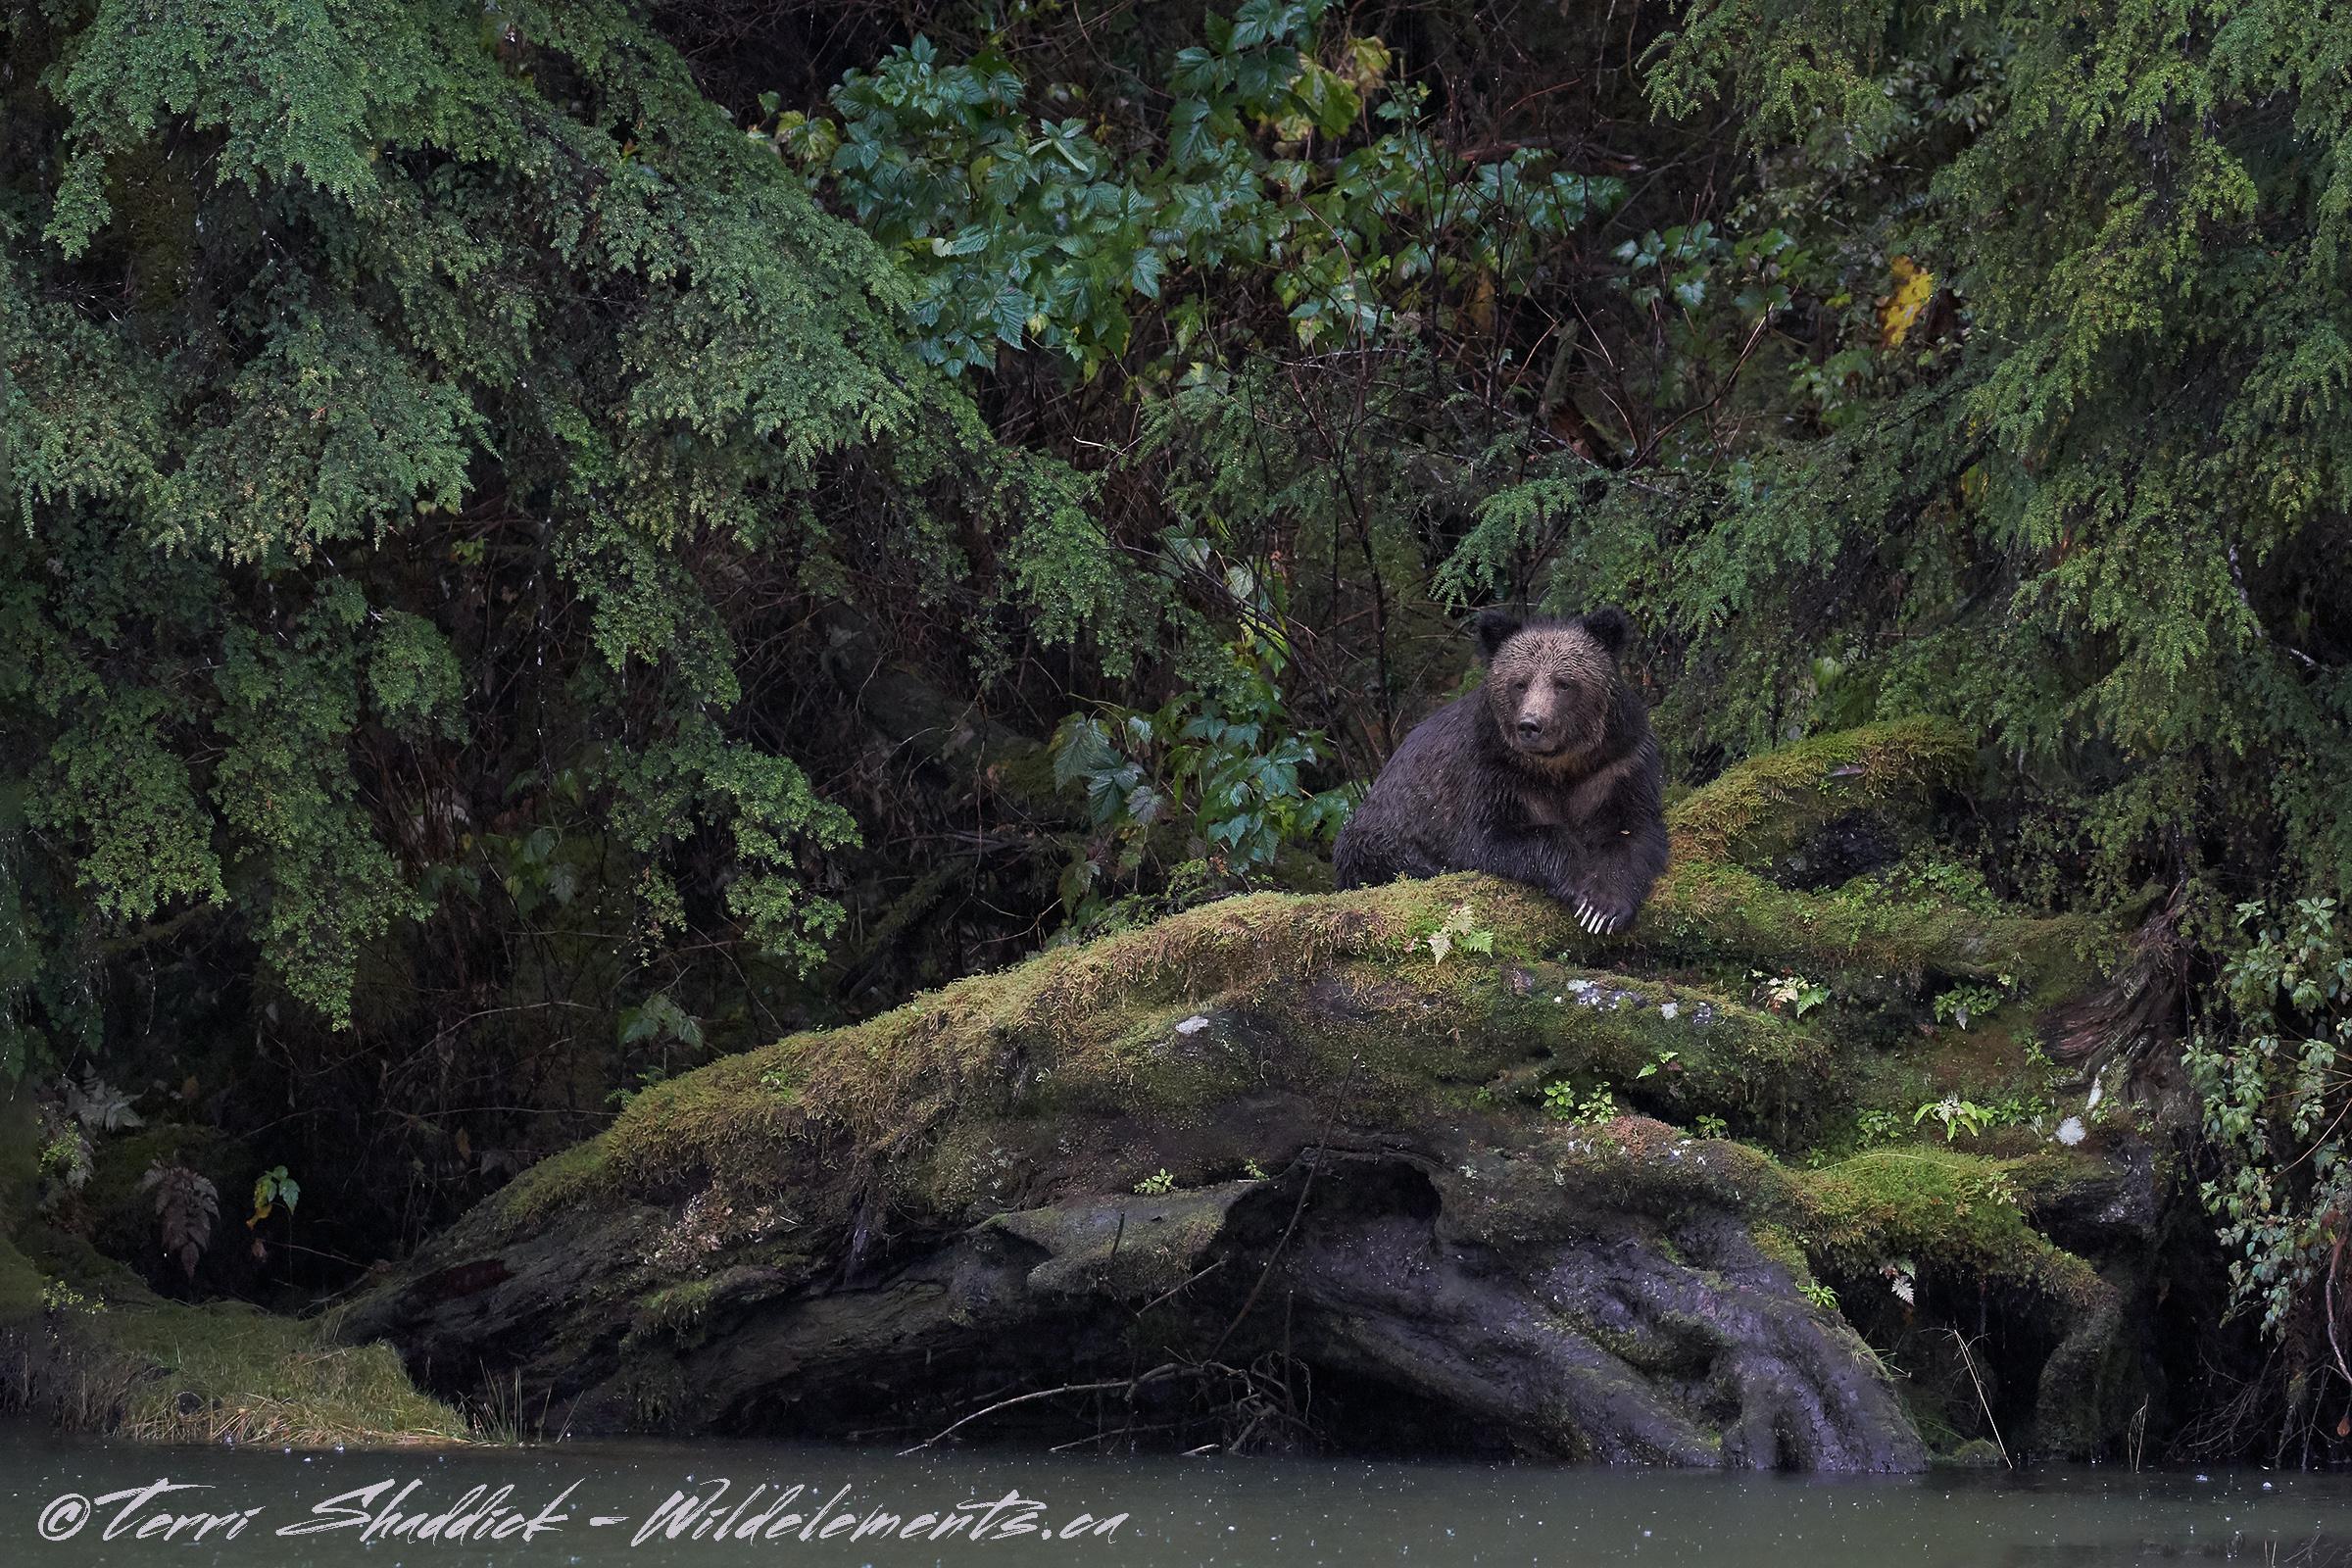 Grizzly Bear Great Bear Rainforest